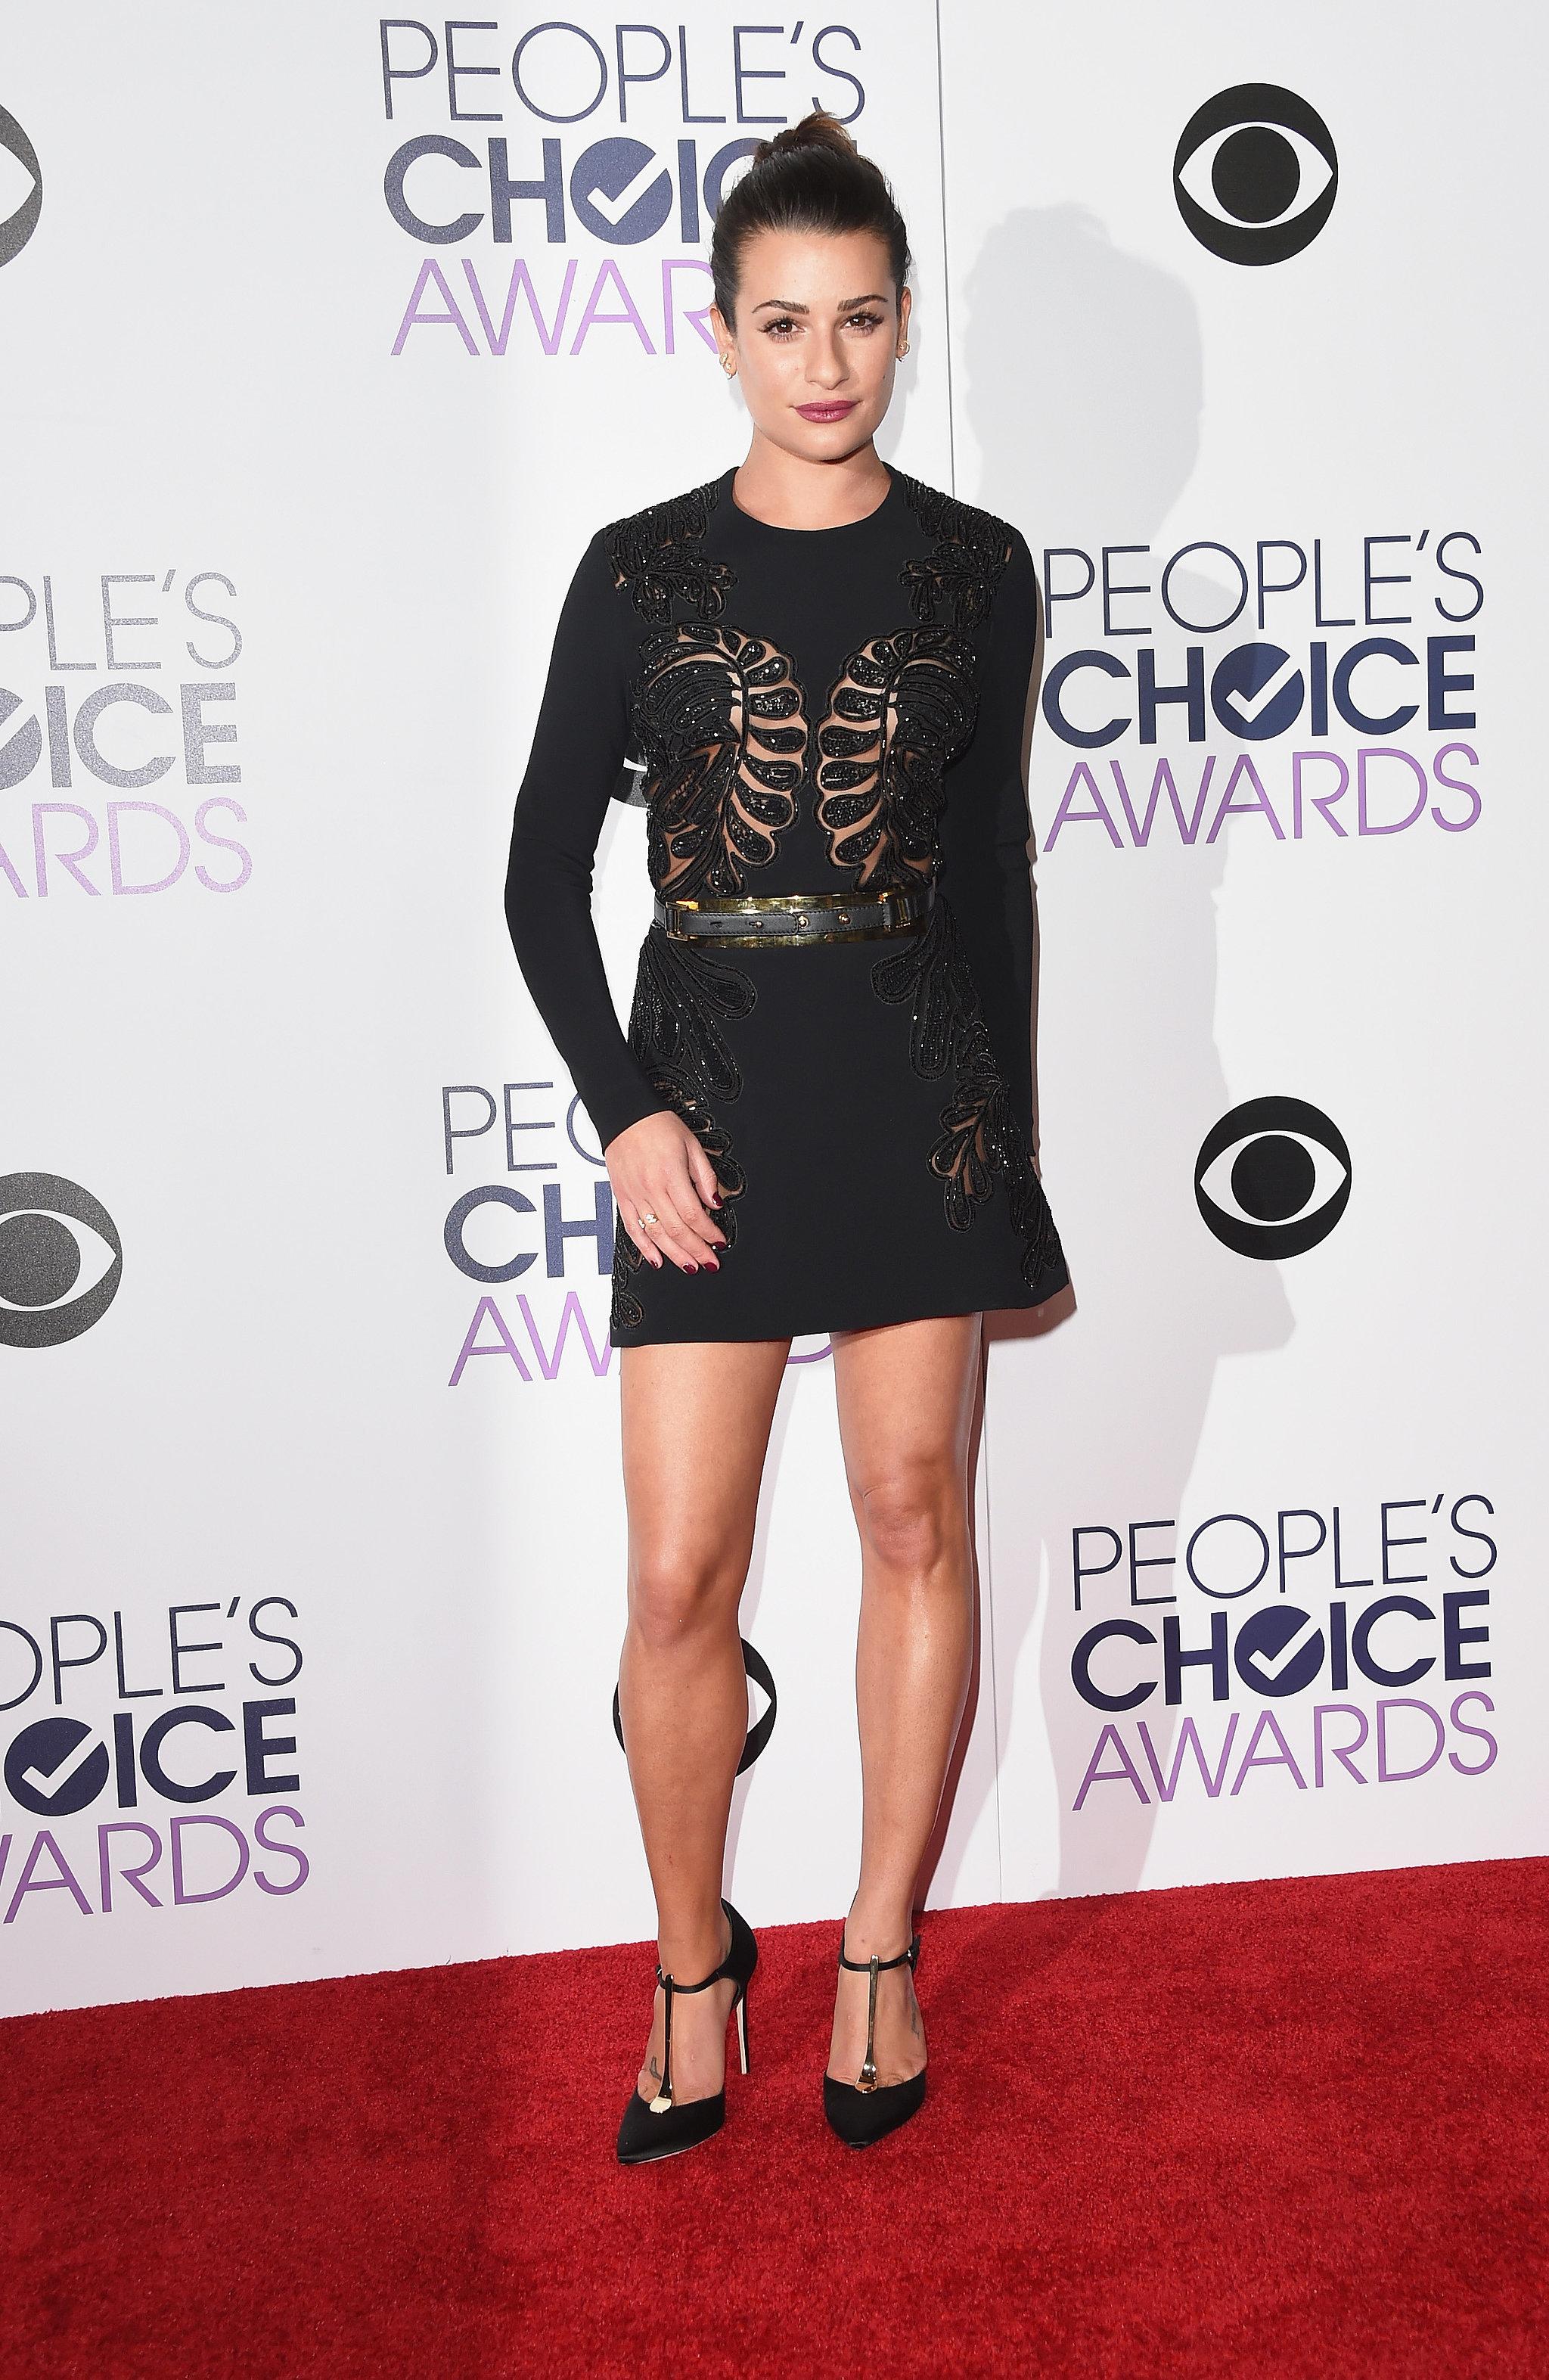 Lea Michele Photos